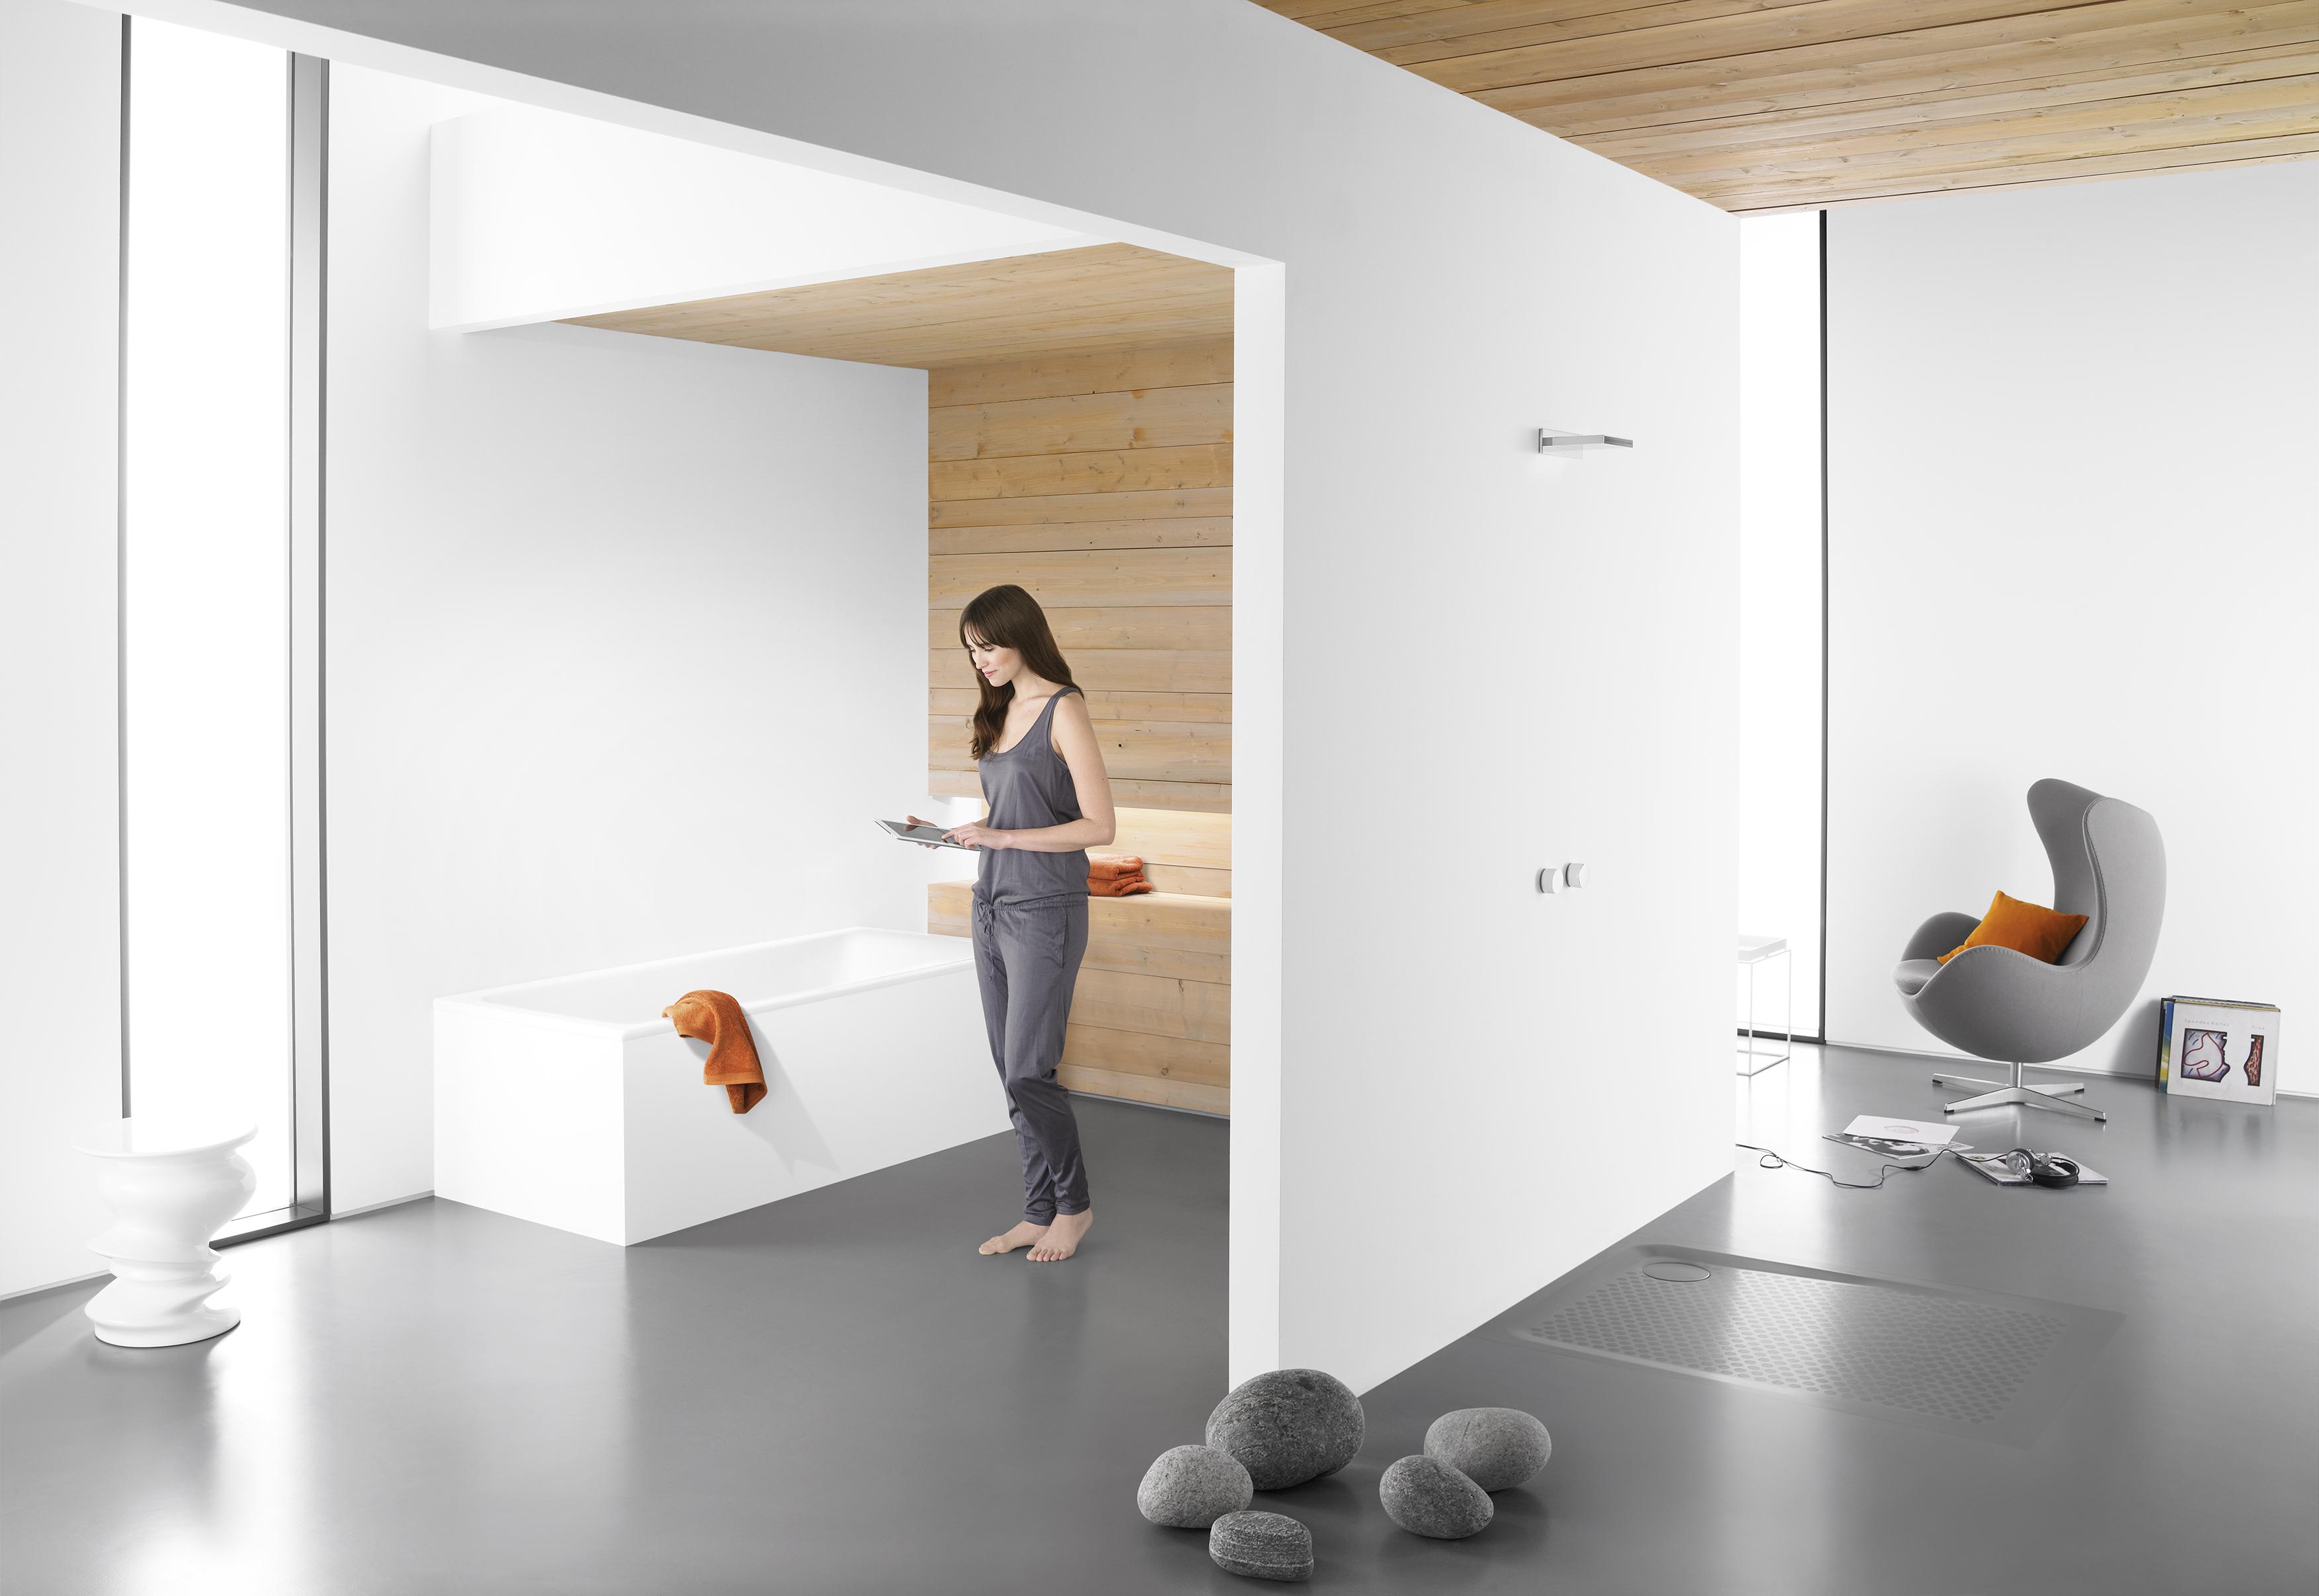 KALDEWEI Kaldewei Puro Duo Time For Essential Things Iconic Bathroom Solu